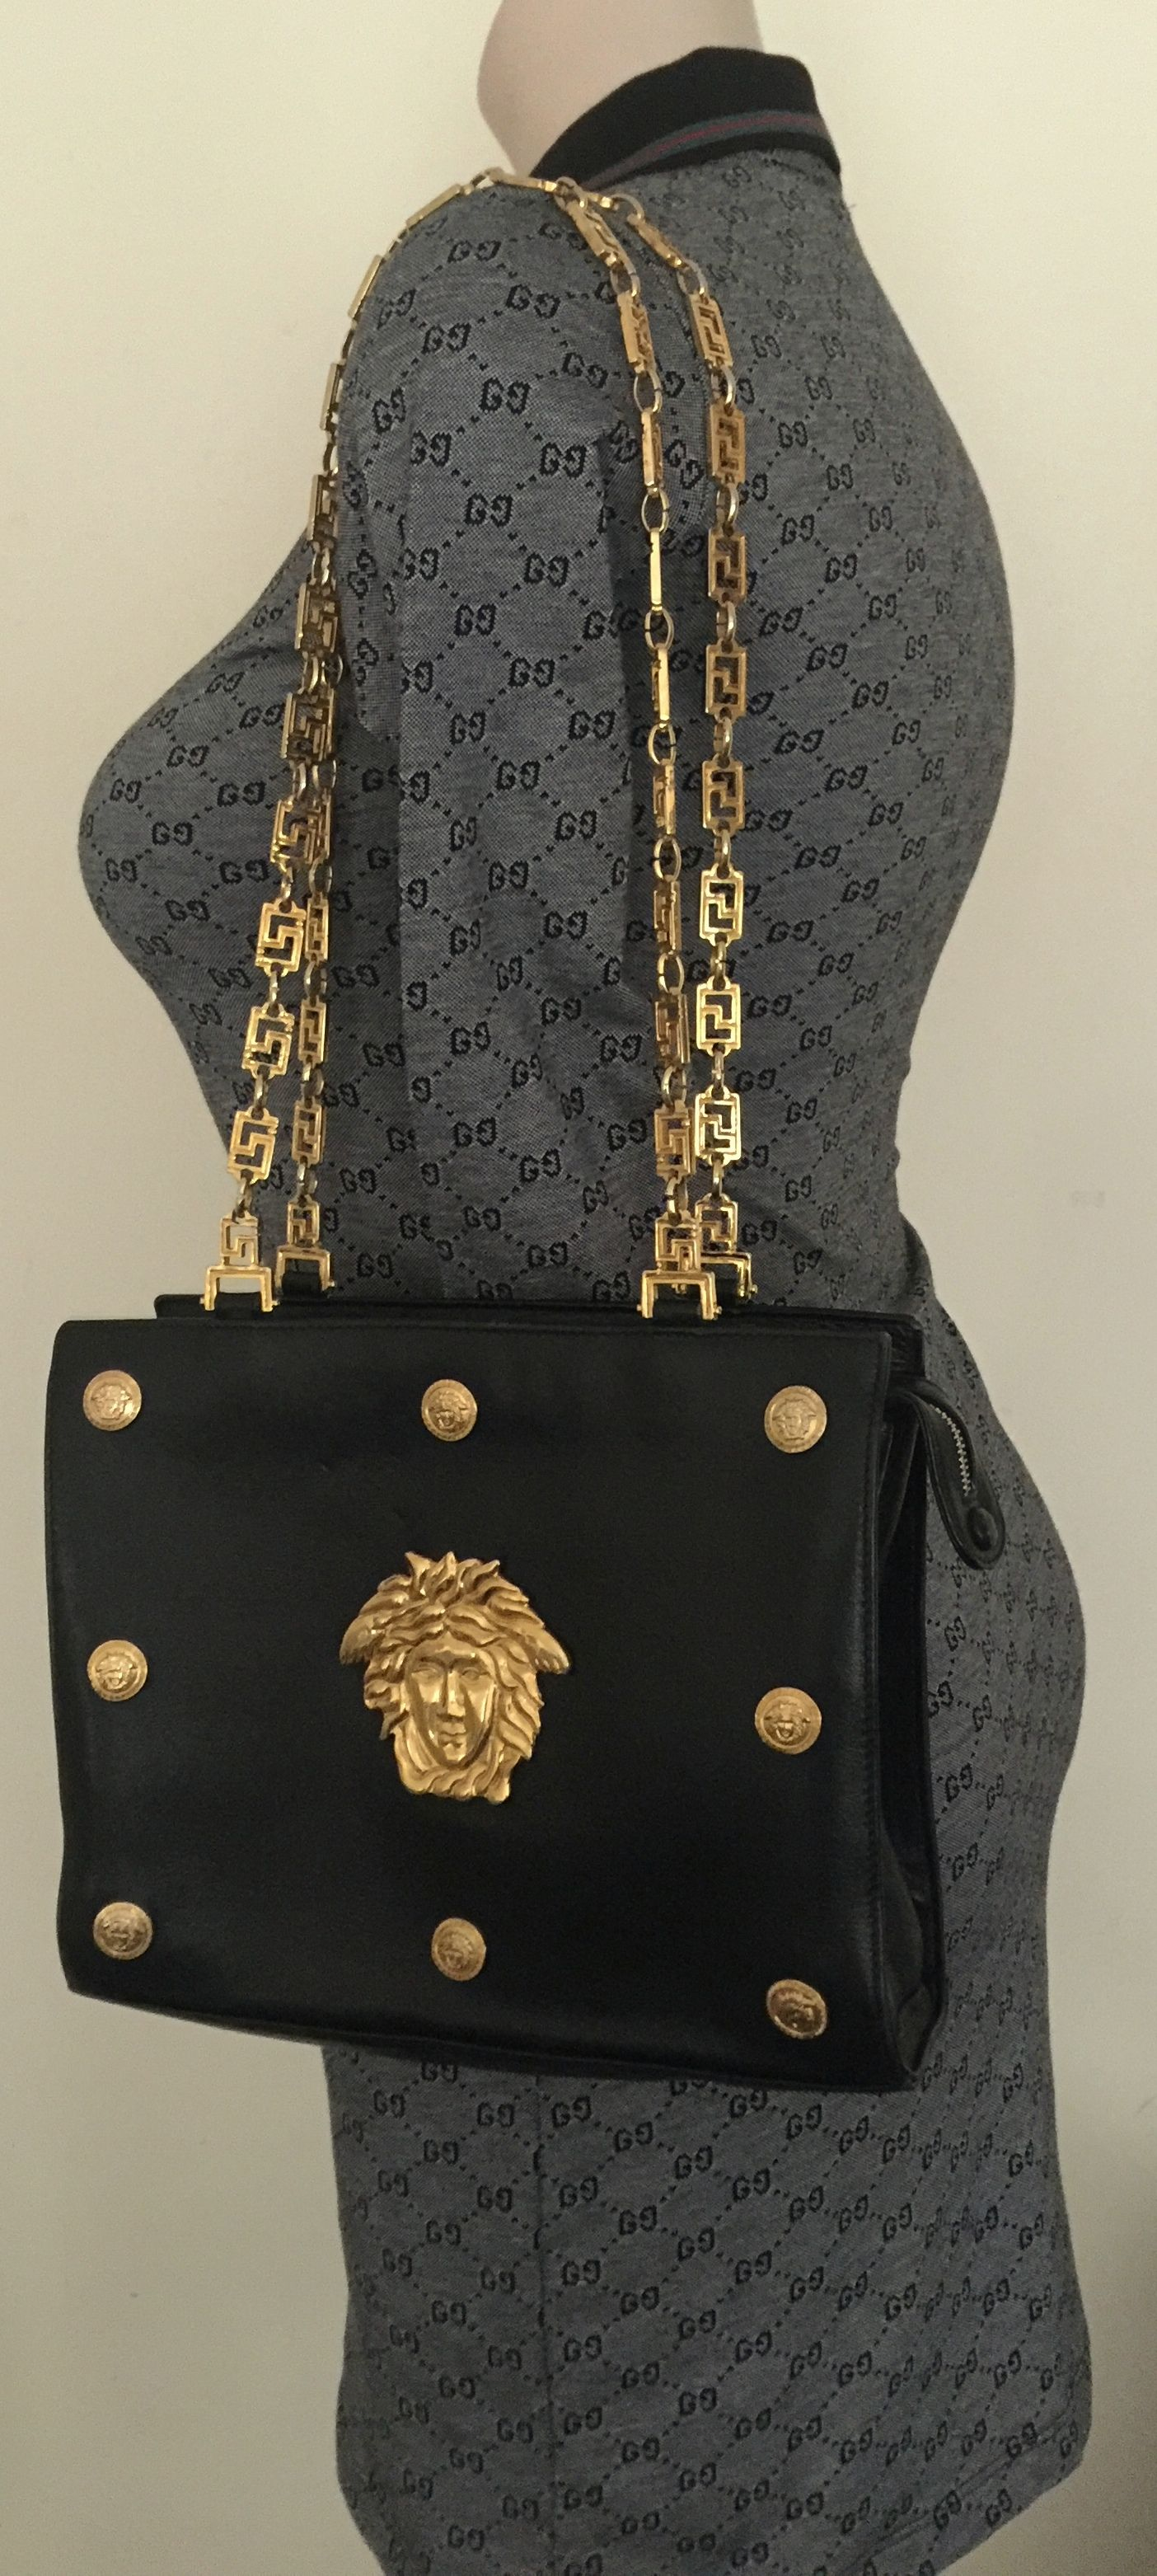 90s Gianni Versace Large Medusa Chain Strap Shoulder Bag Rare Gianni Versace Shoulder Bag Bags